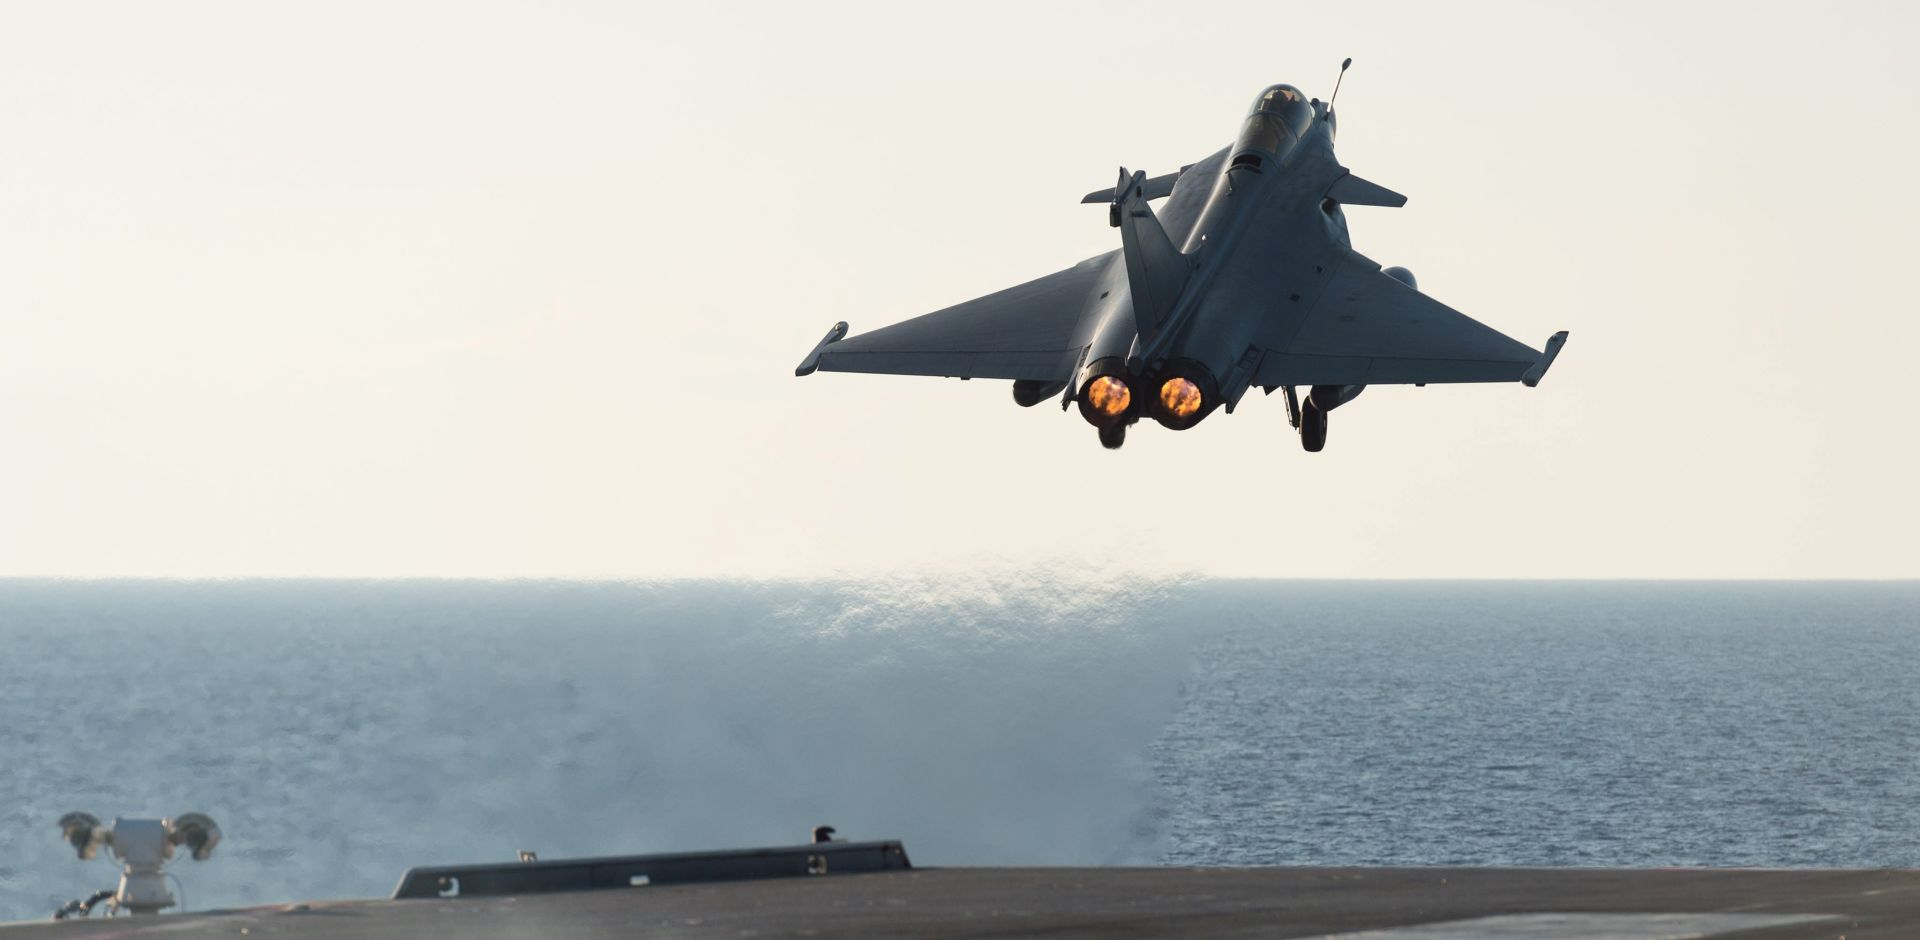 Francuska uključila nosač aviona Charles de Gaulle u borbu protiv IS-a